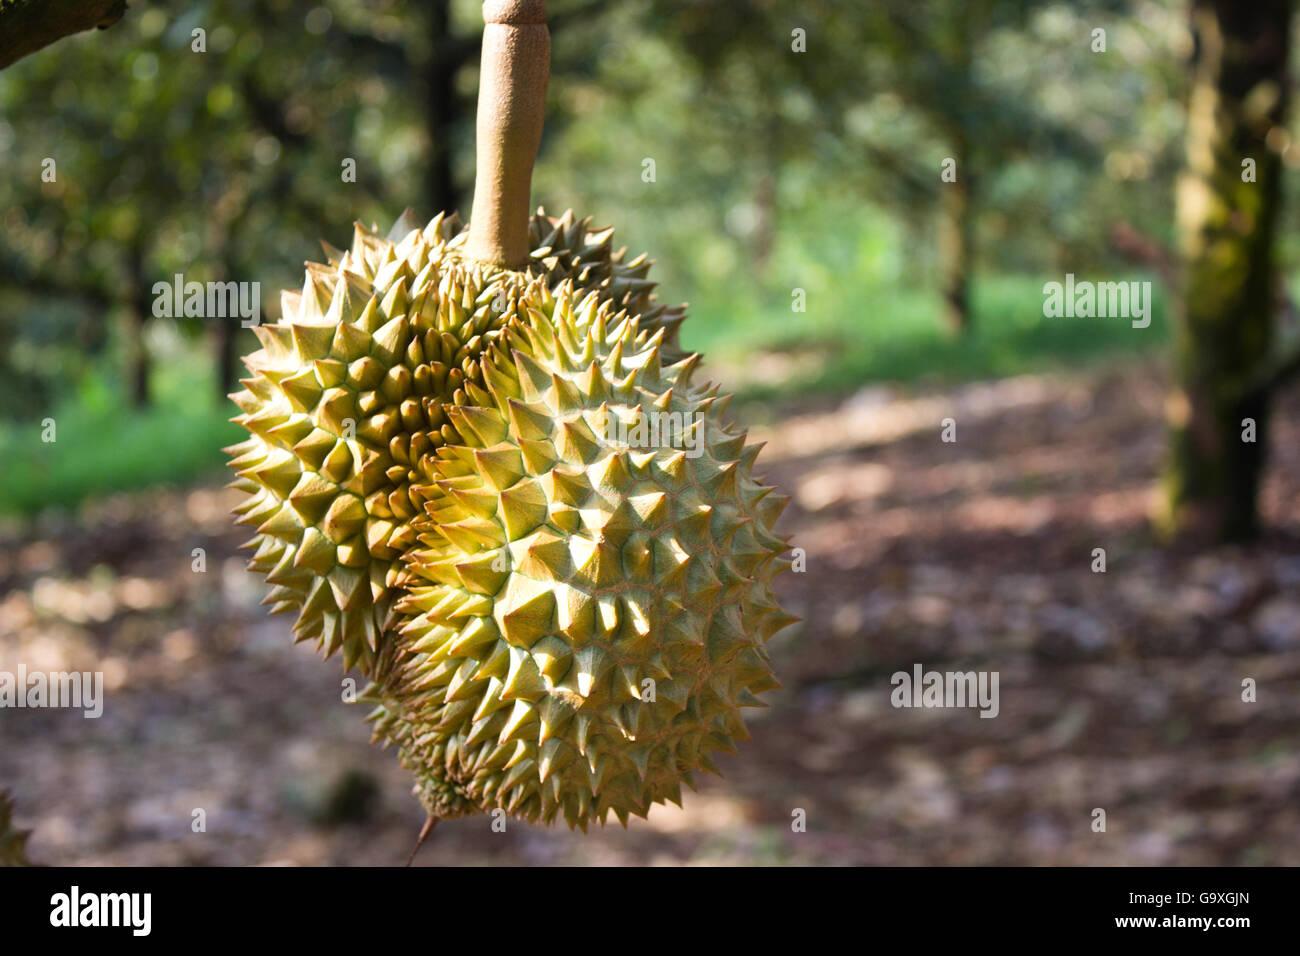 Thai fruit durian tree in farm at Thailand Stock Photo: 109377933 - Alamy